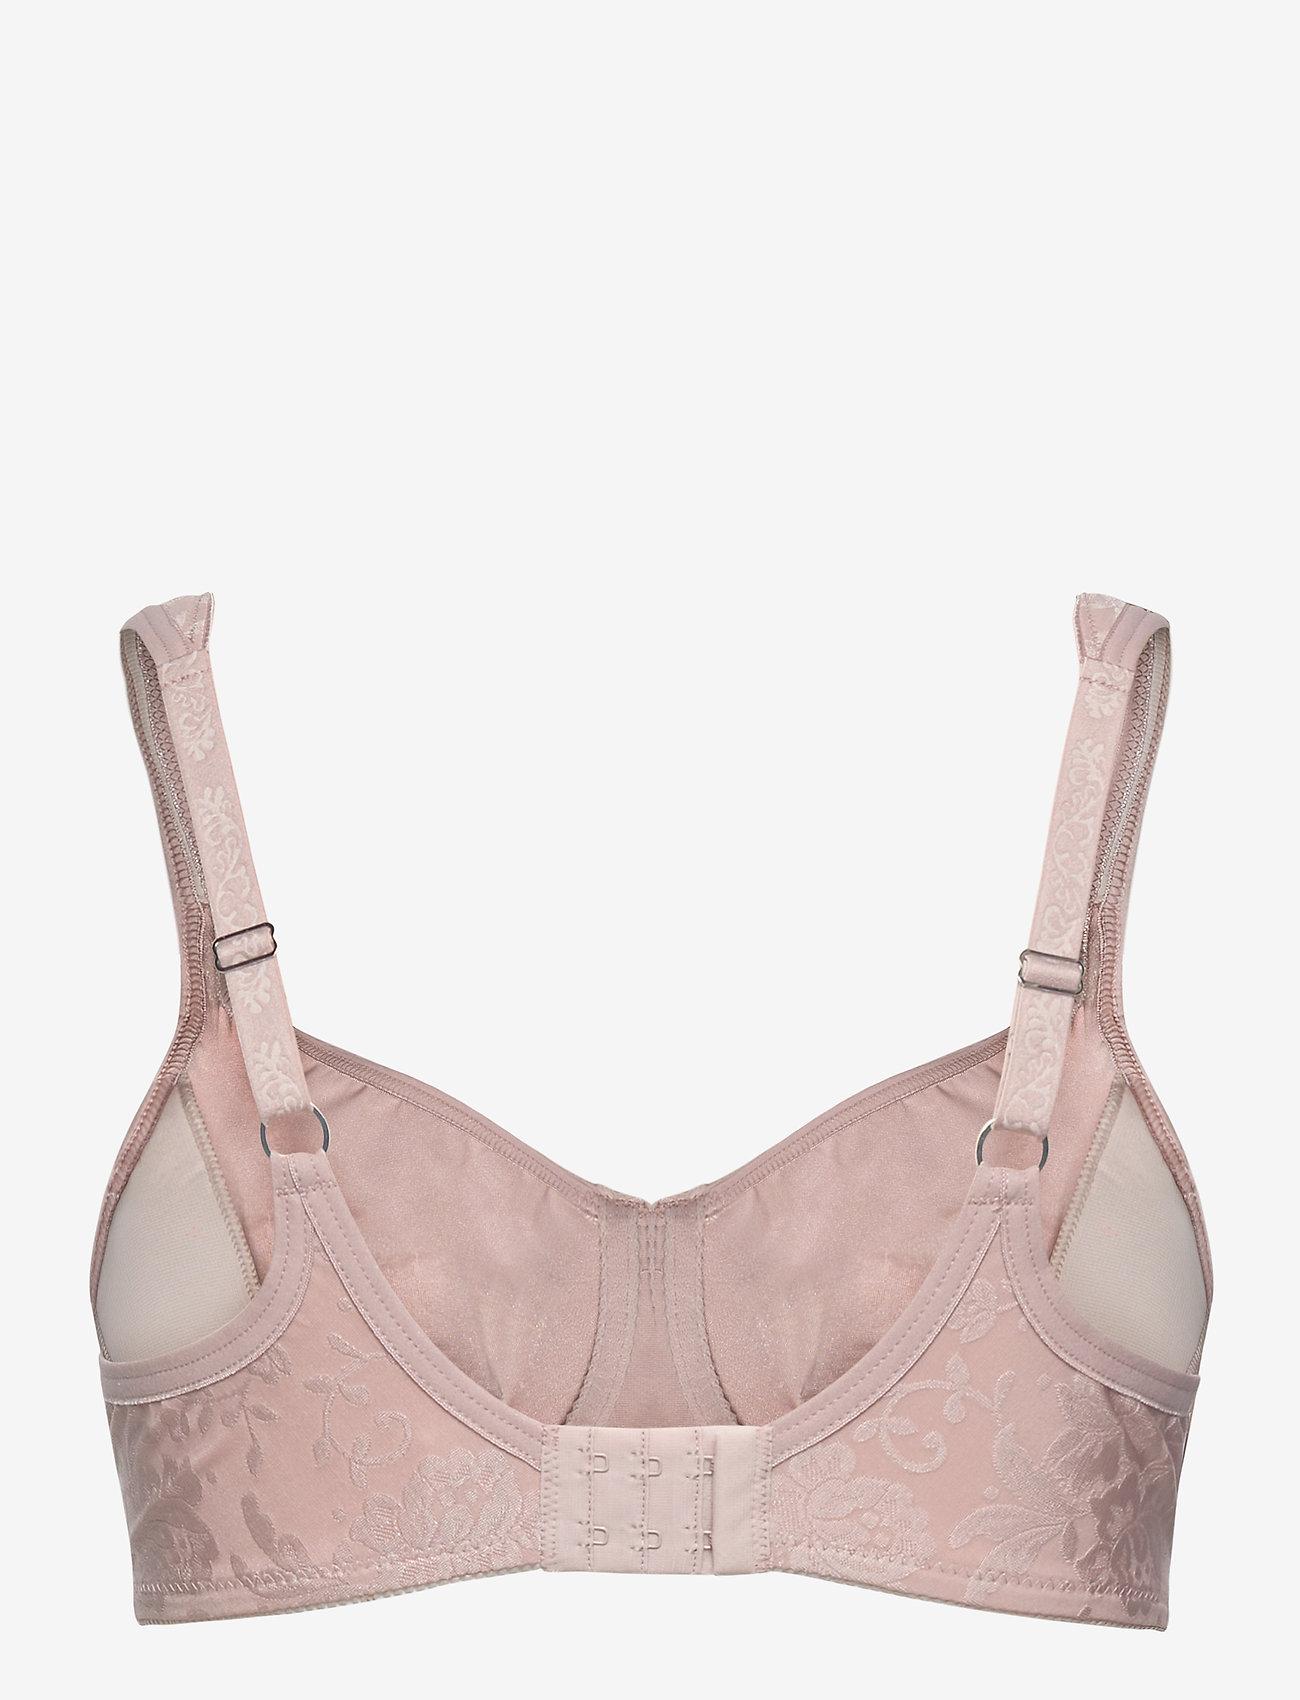 Abecita - Beatrice, moulded wire - balconette-liivit - shadow pink - 1